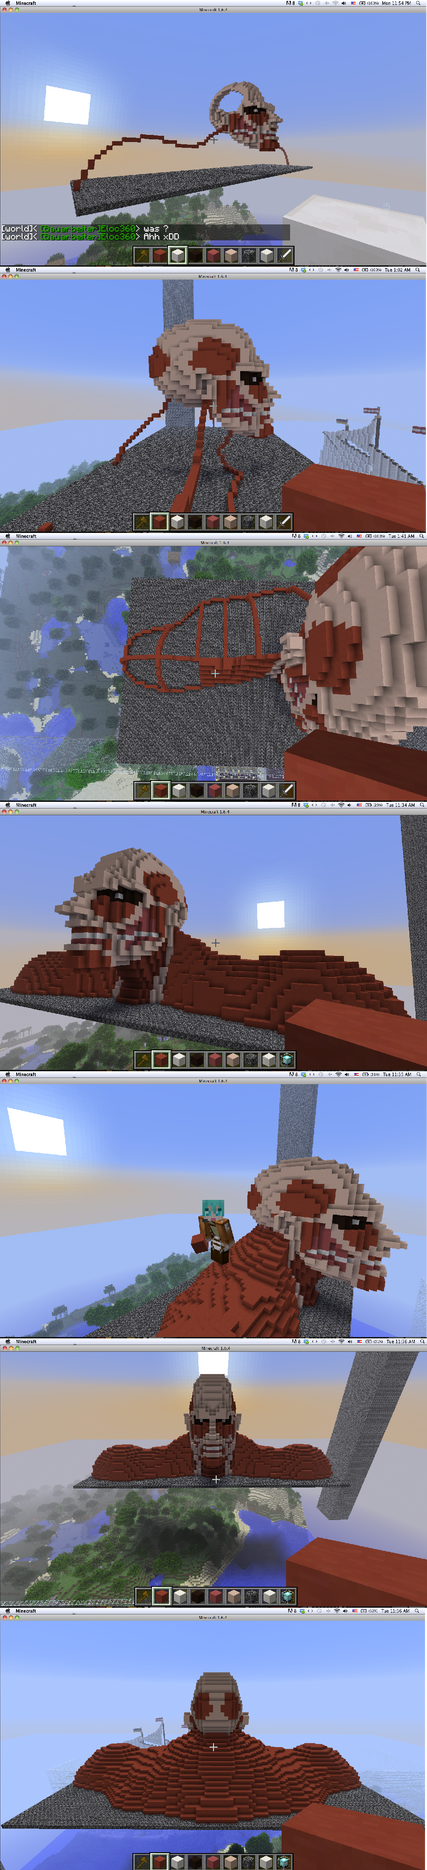 Minecraft Attack On Titan Jean Skin Minecraft - colossal titan